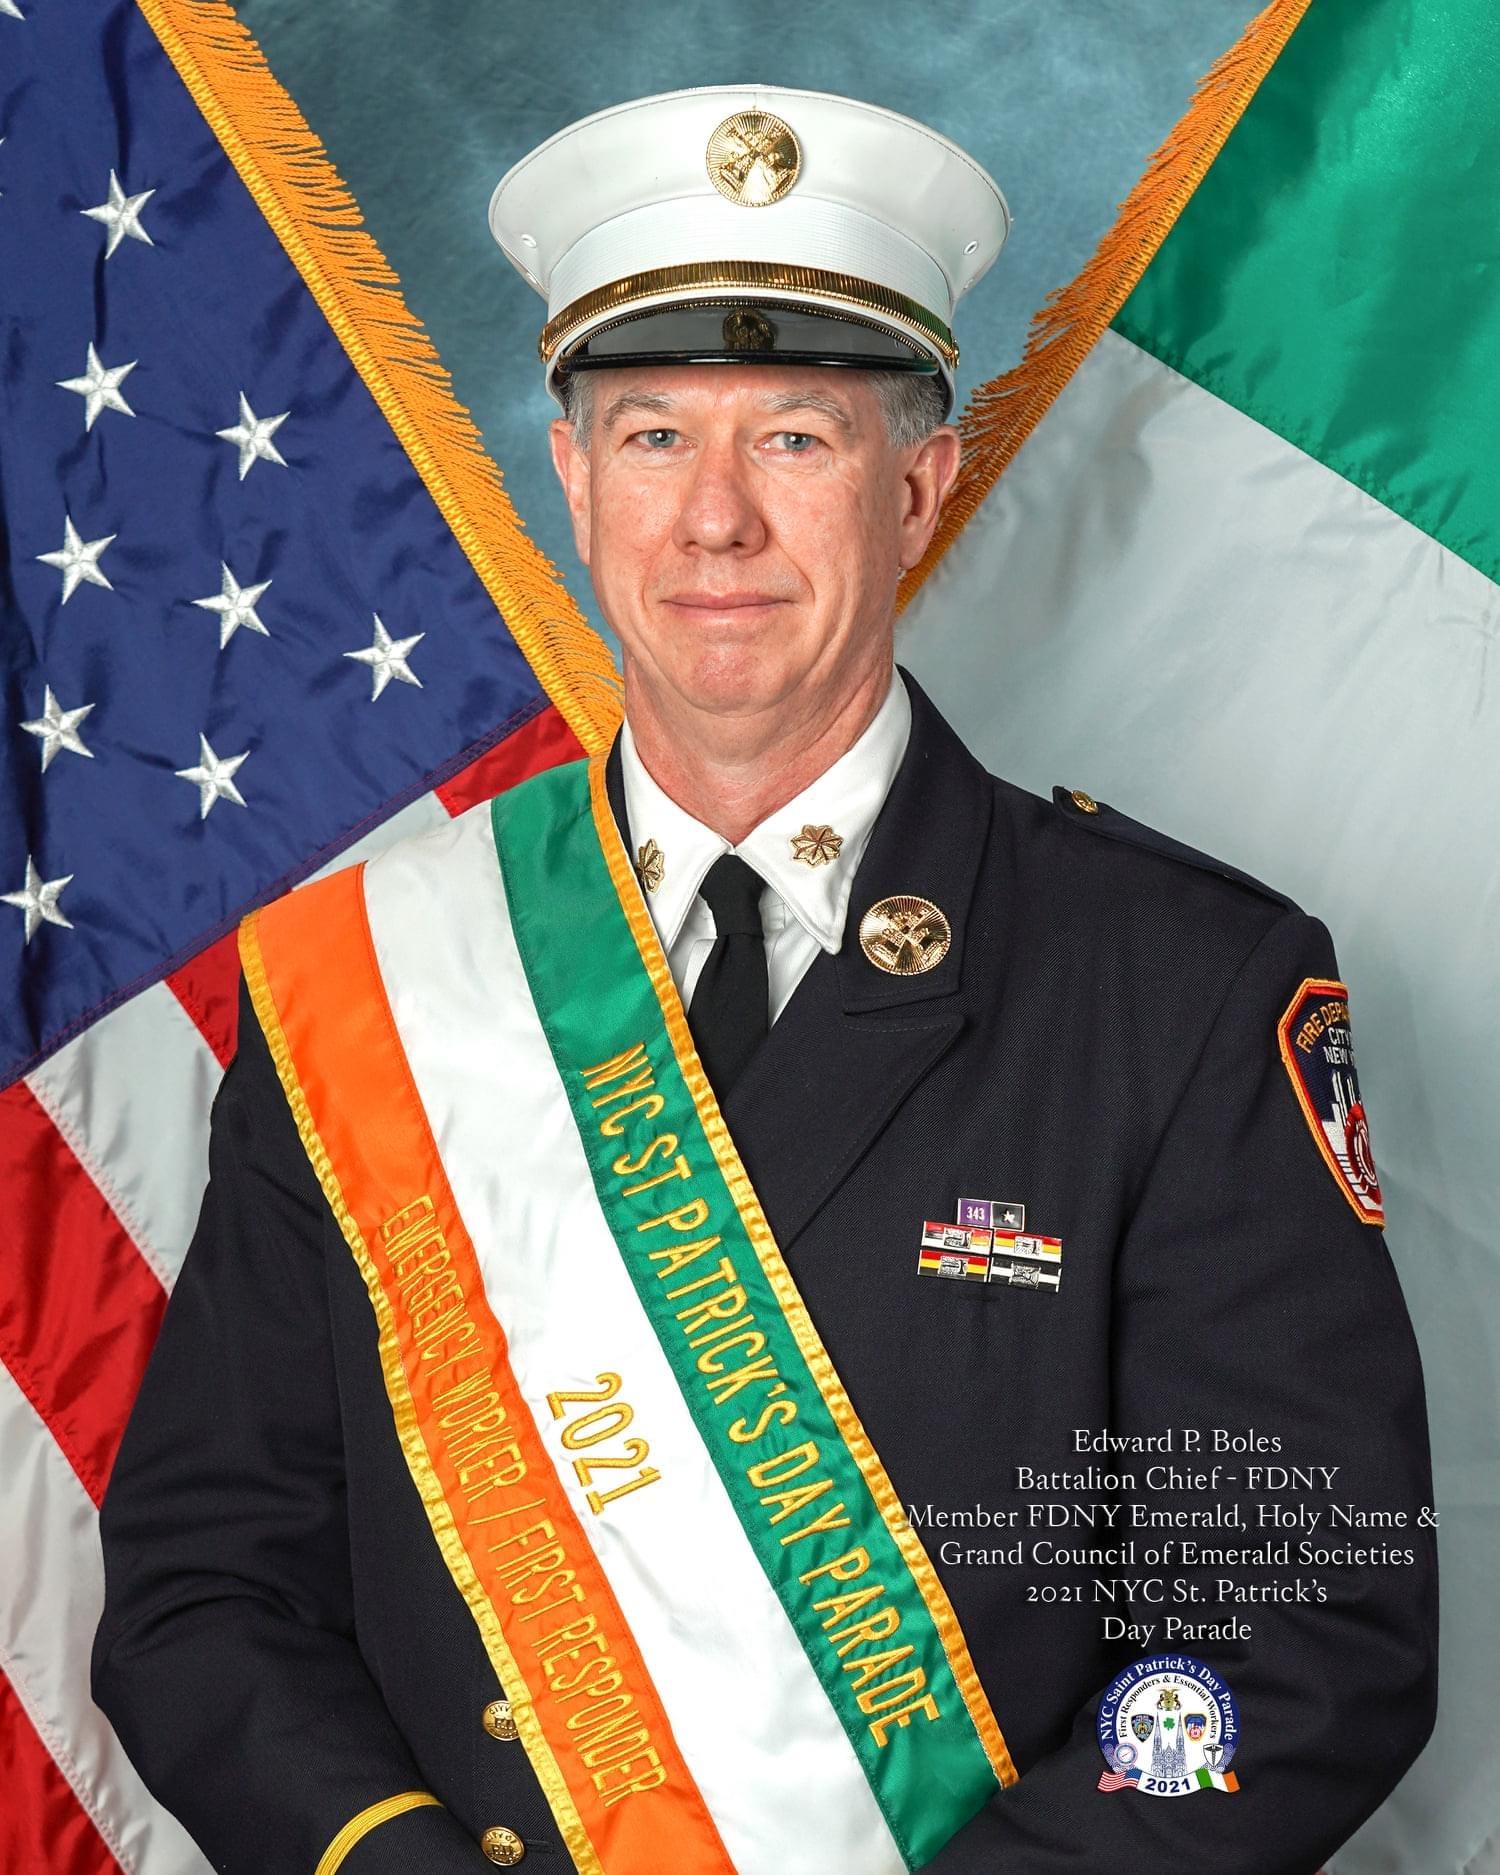 Edward P. Boles, 2020 Honoree